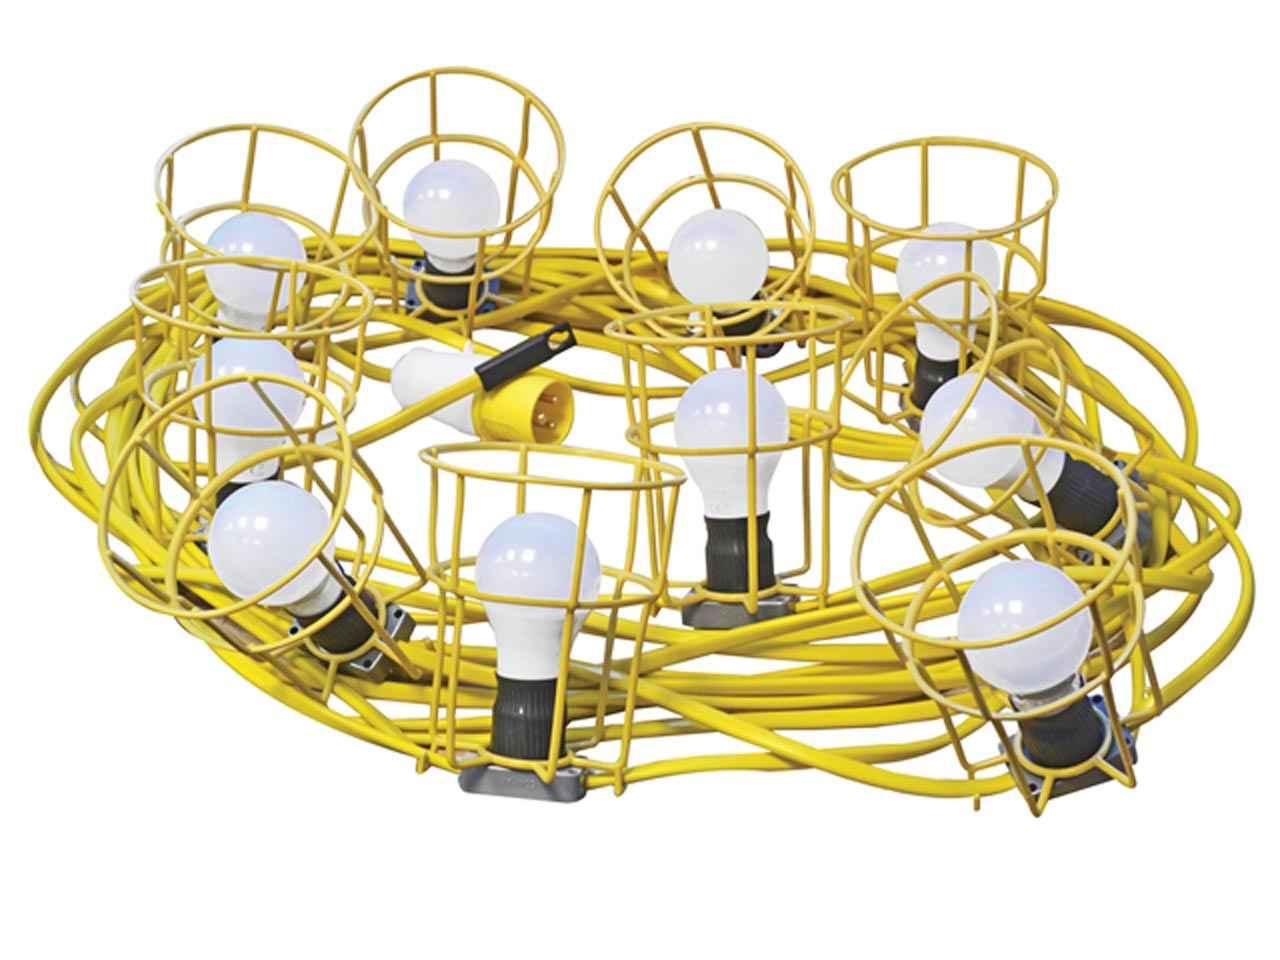 Faithfull Power Plus FPPSLFESTOON Festoon Lights 10 ES Ampoules 110 V 22 m